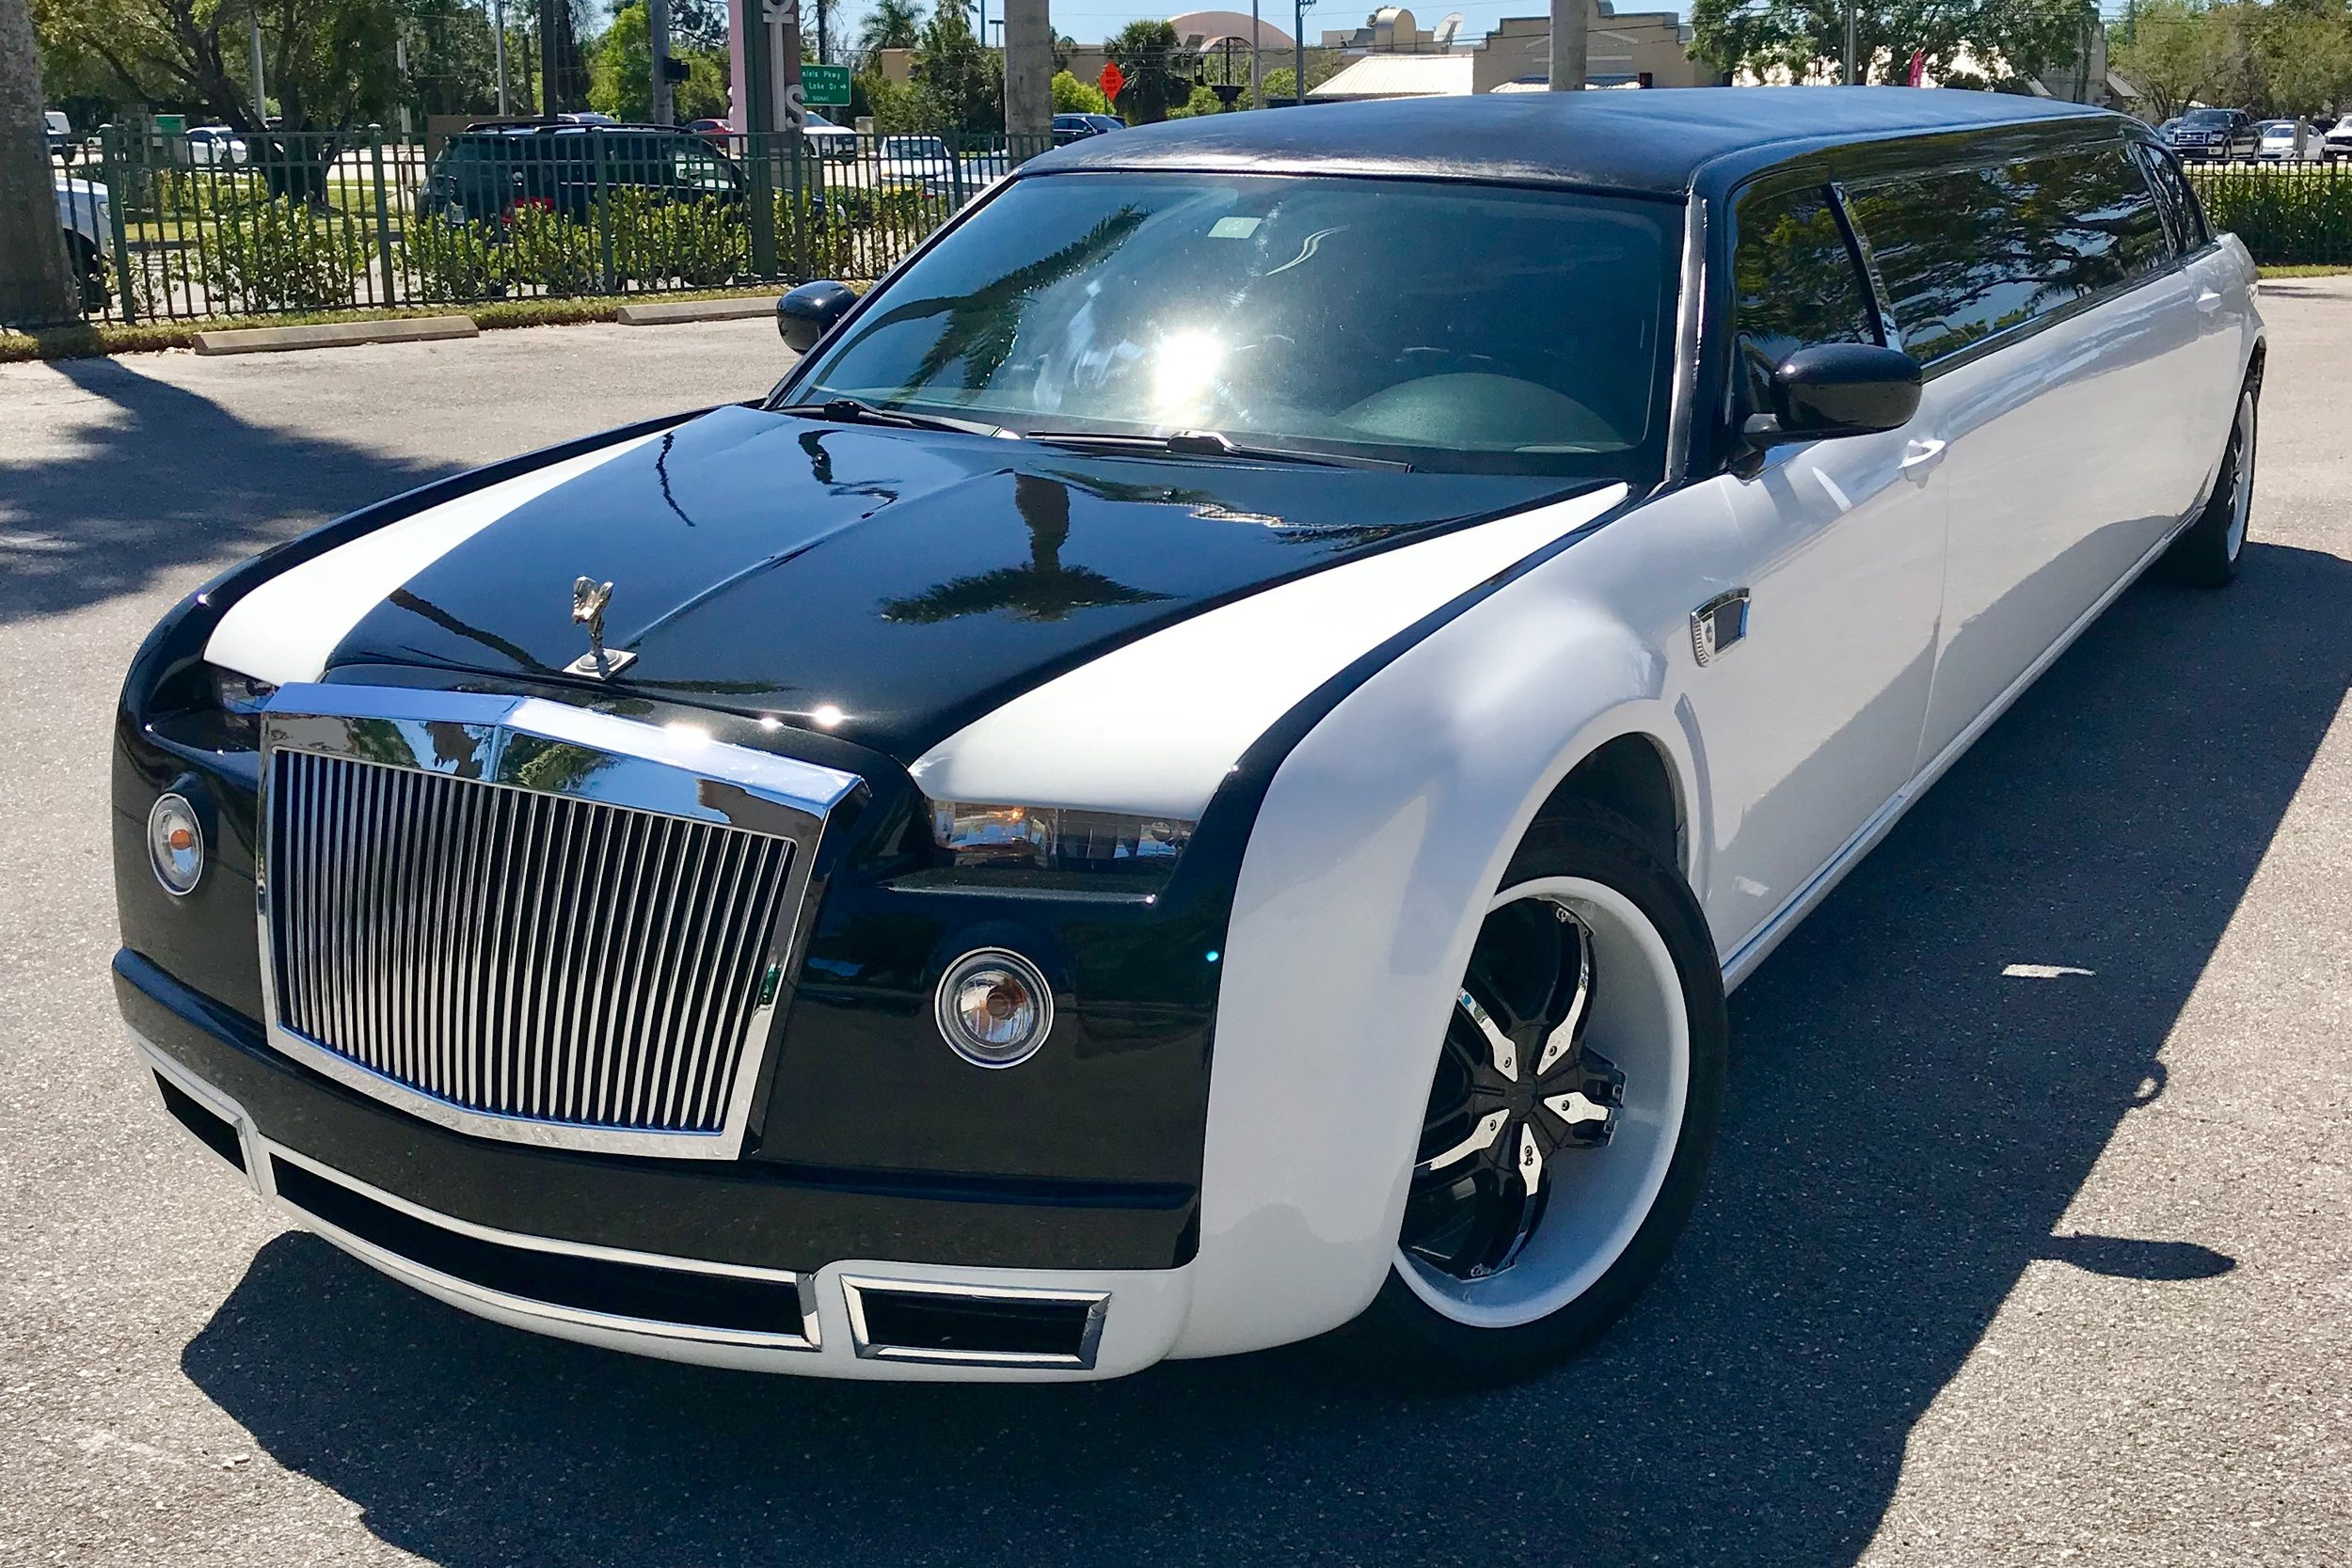 vip-limo-service-rolls-royce-phantom-300-exterior-03.jpg